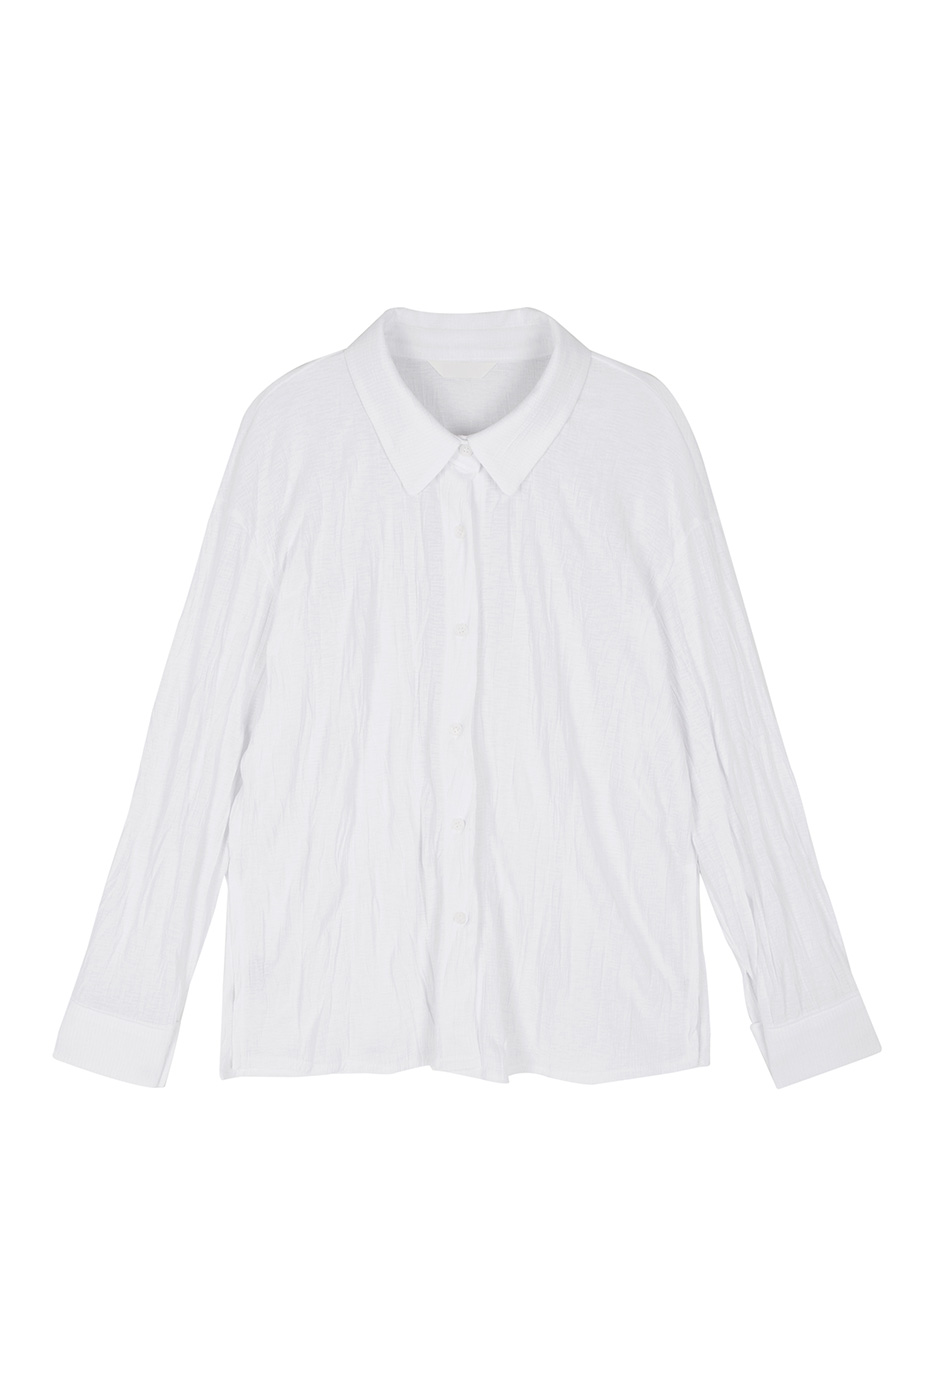 Mark crease collar blouse